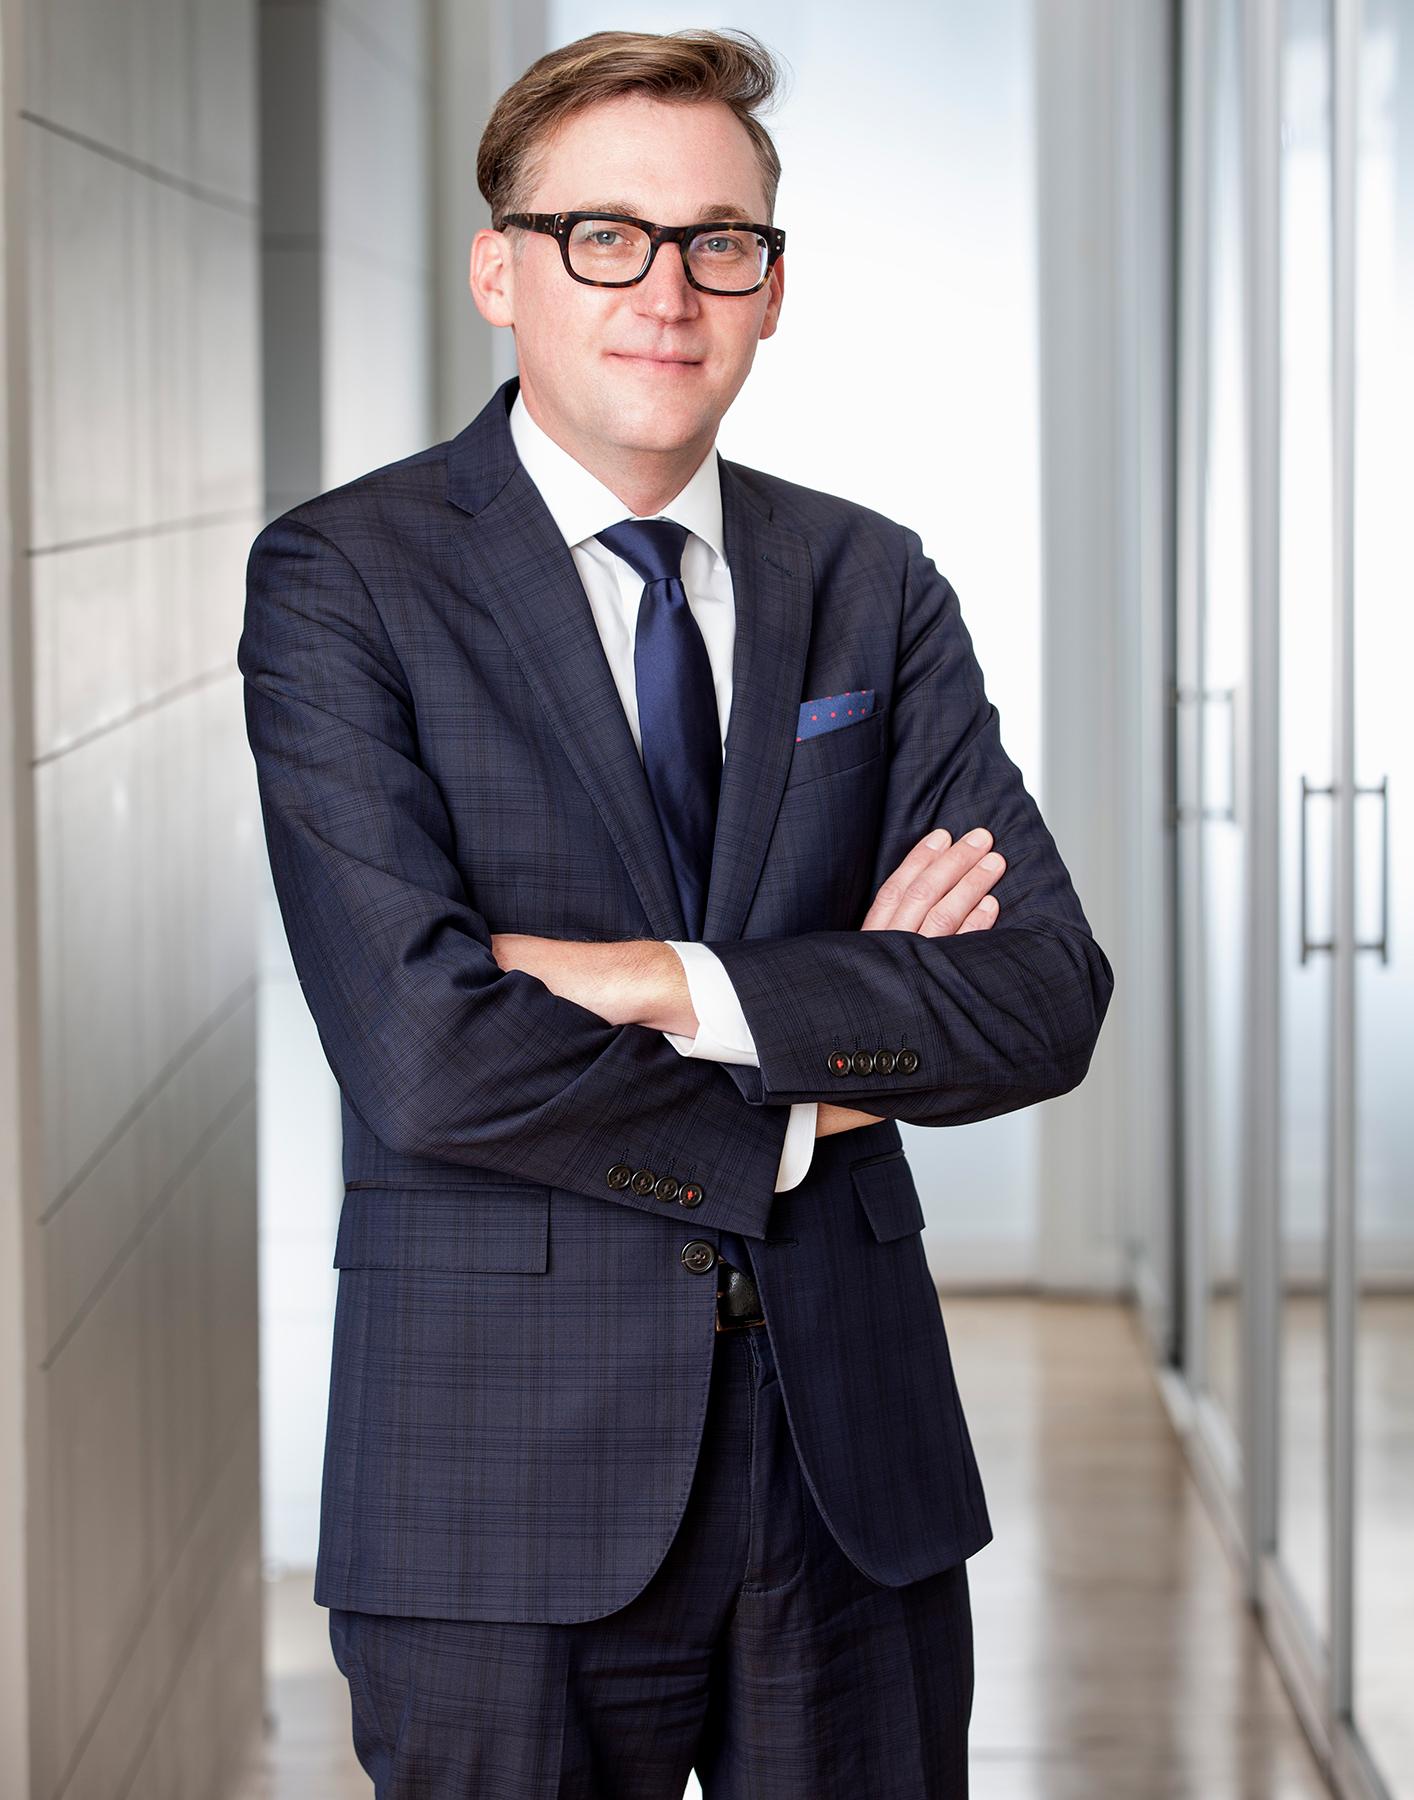 Dr.-Craig-Baldenhofer-Plastic-Surgeon-In-Nyc-Editorial-Profile-Portrait-2018-©-Jonathan-R.-Beckerman-Photography-95.jpg